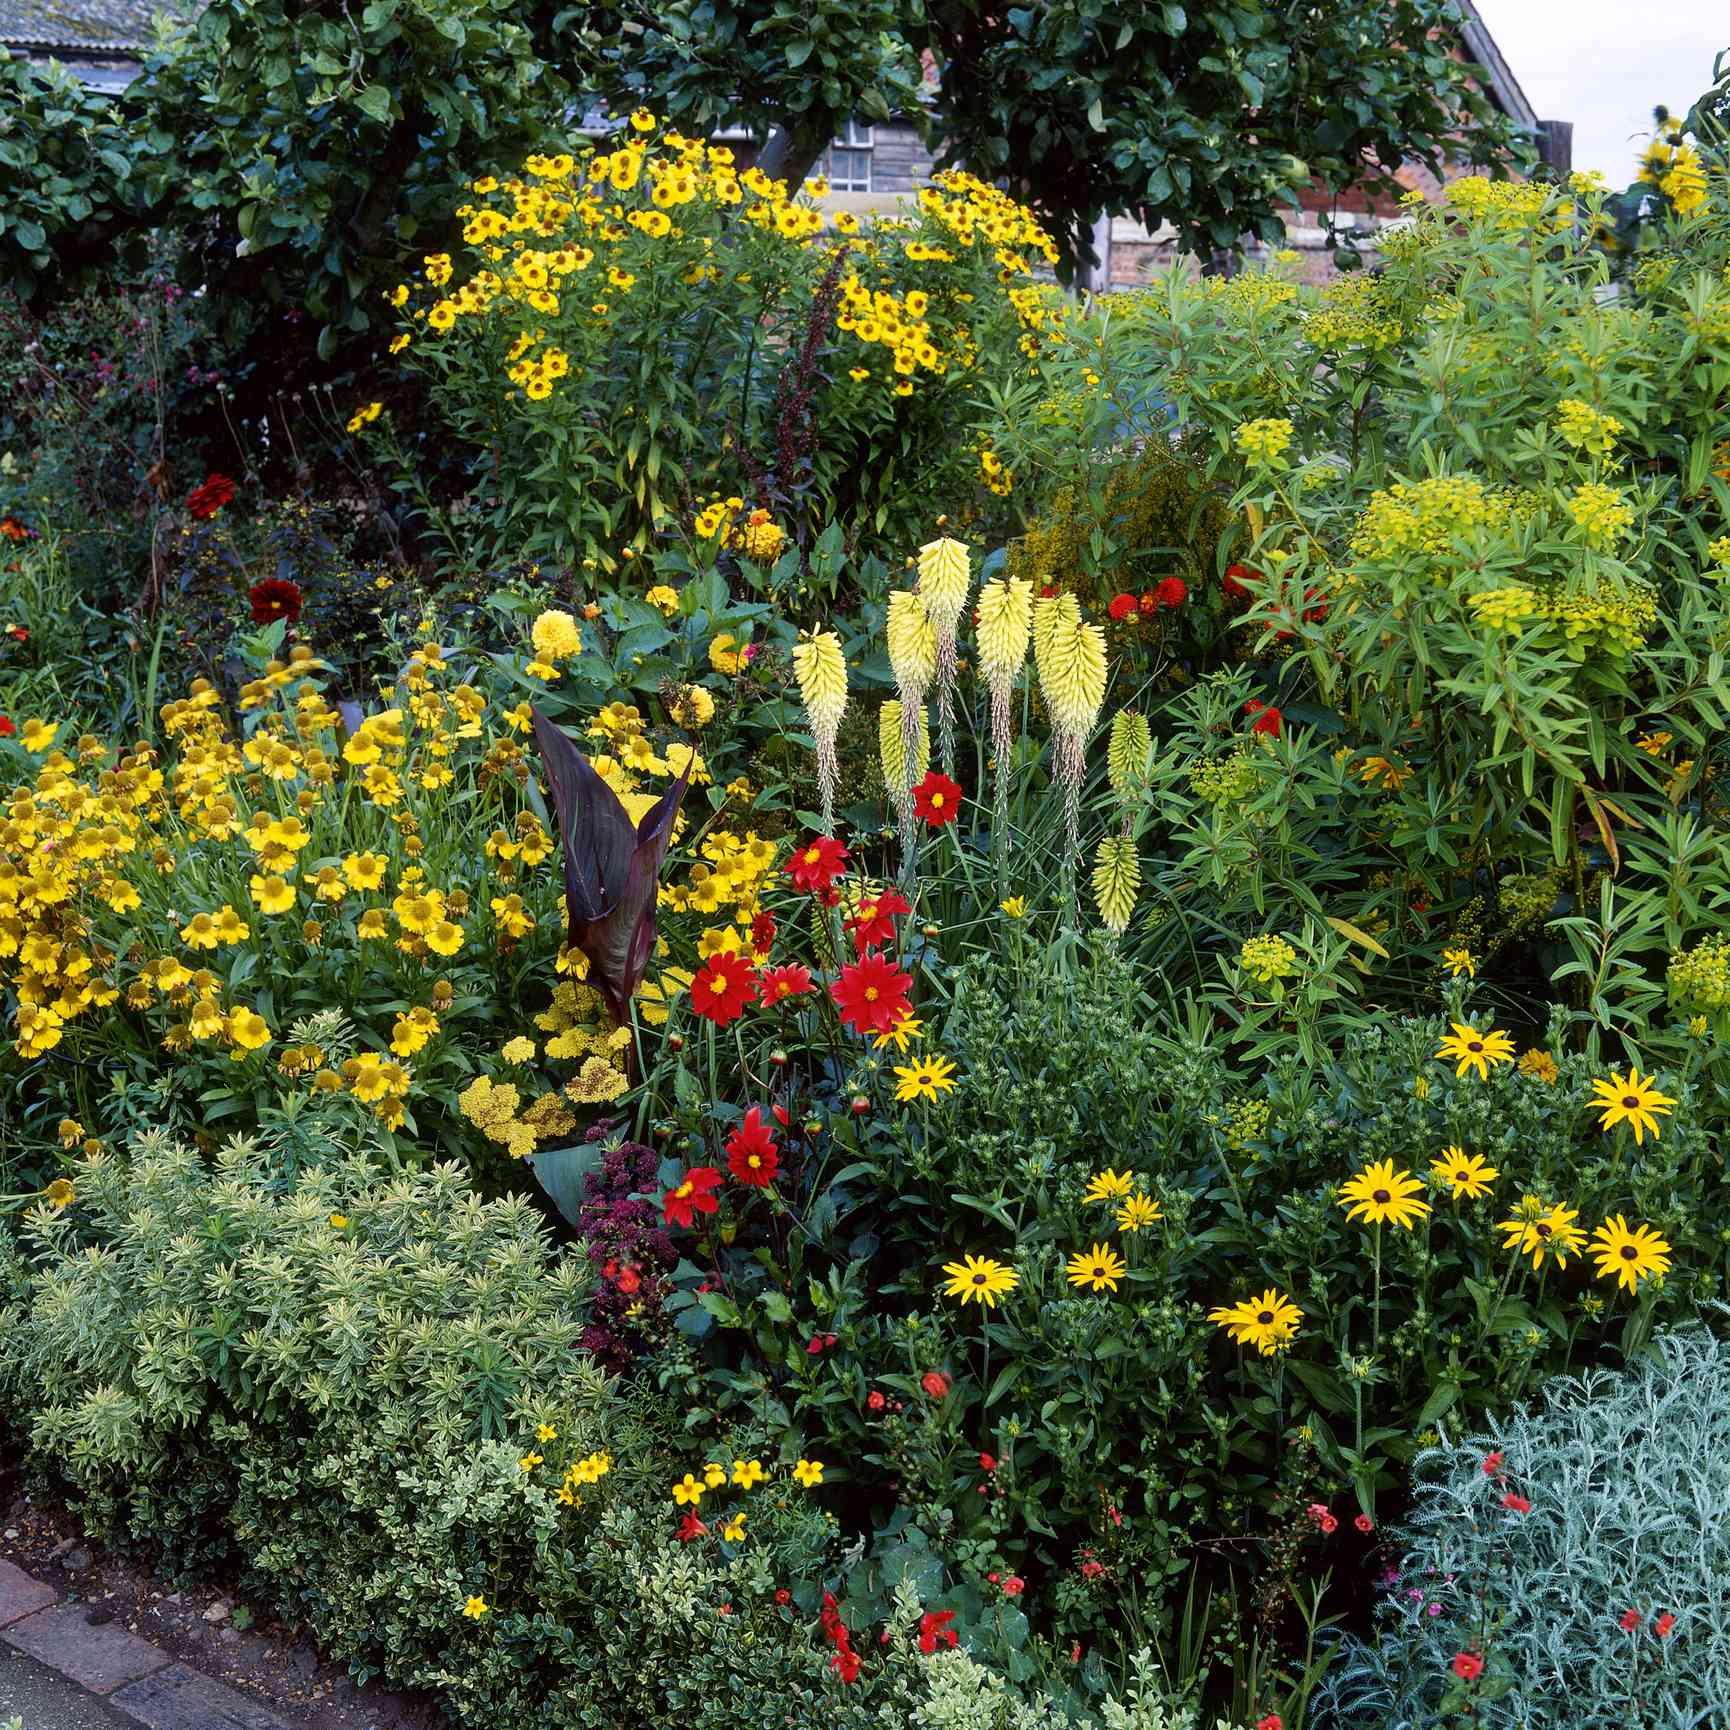 Yellow Kniphofia, Helenium, and Dahlias